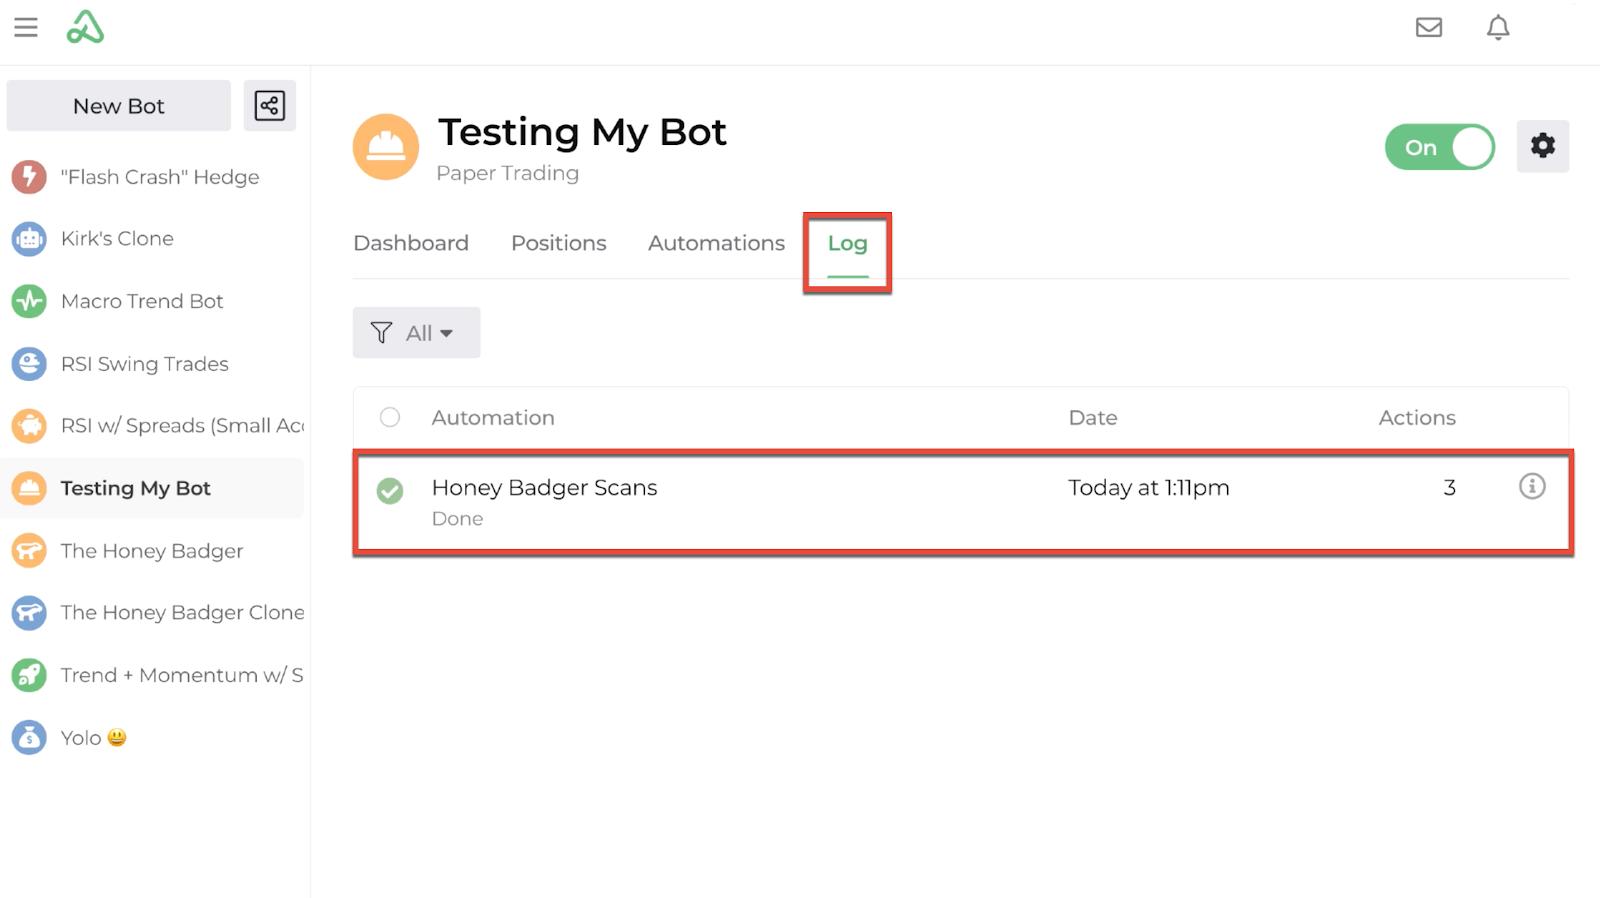 Screenshot of the bot log display